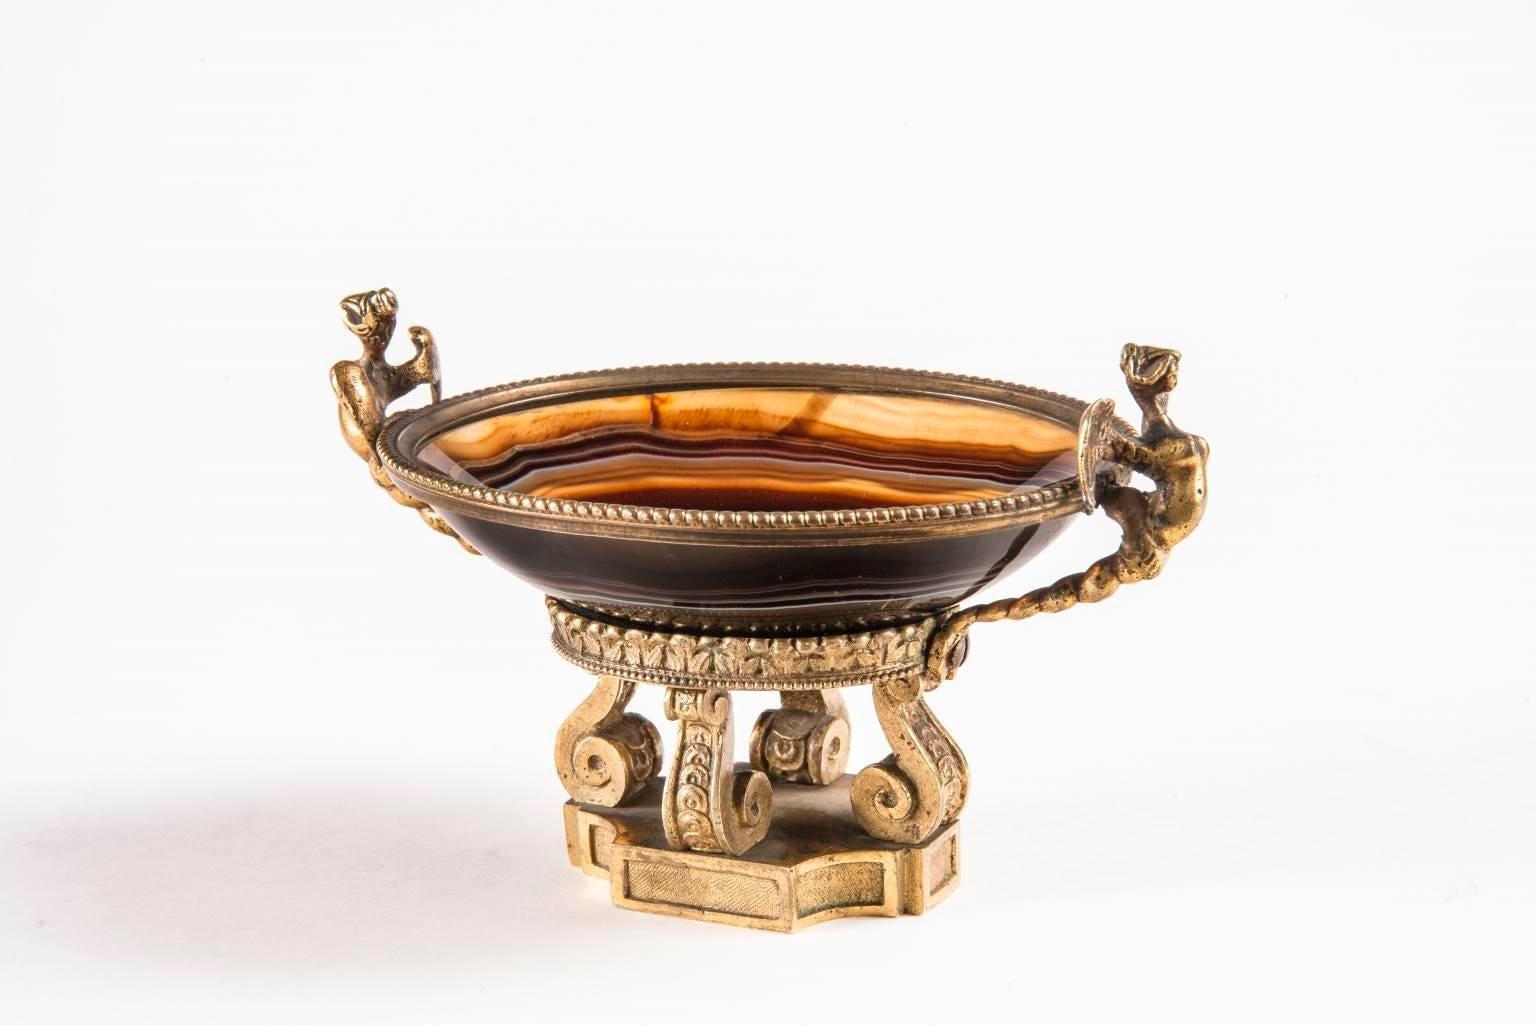 Neoclassical Imperial Gilded Bronze Carnelian Salt cellar 19 century